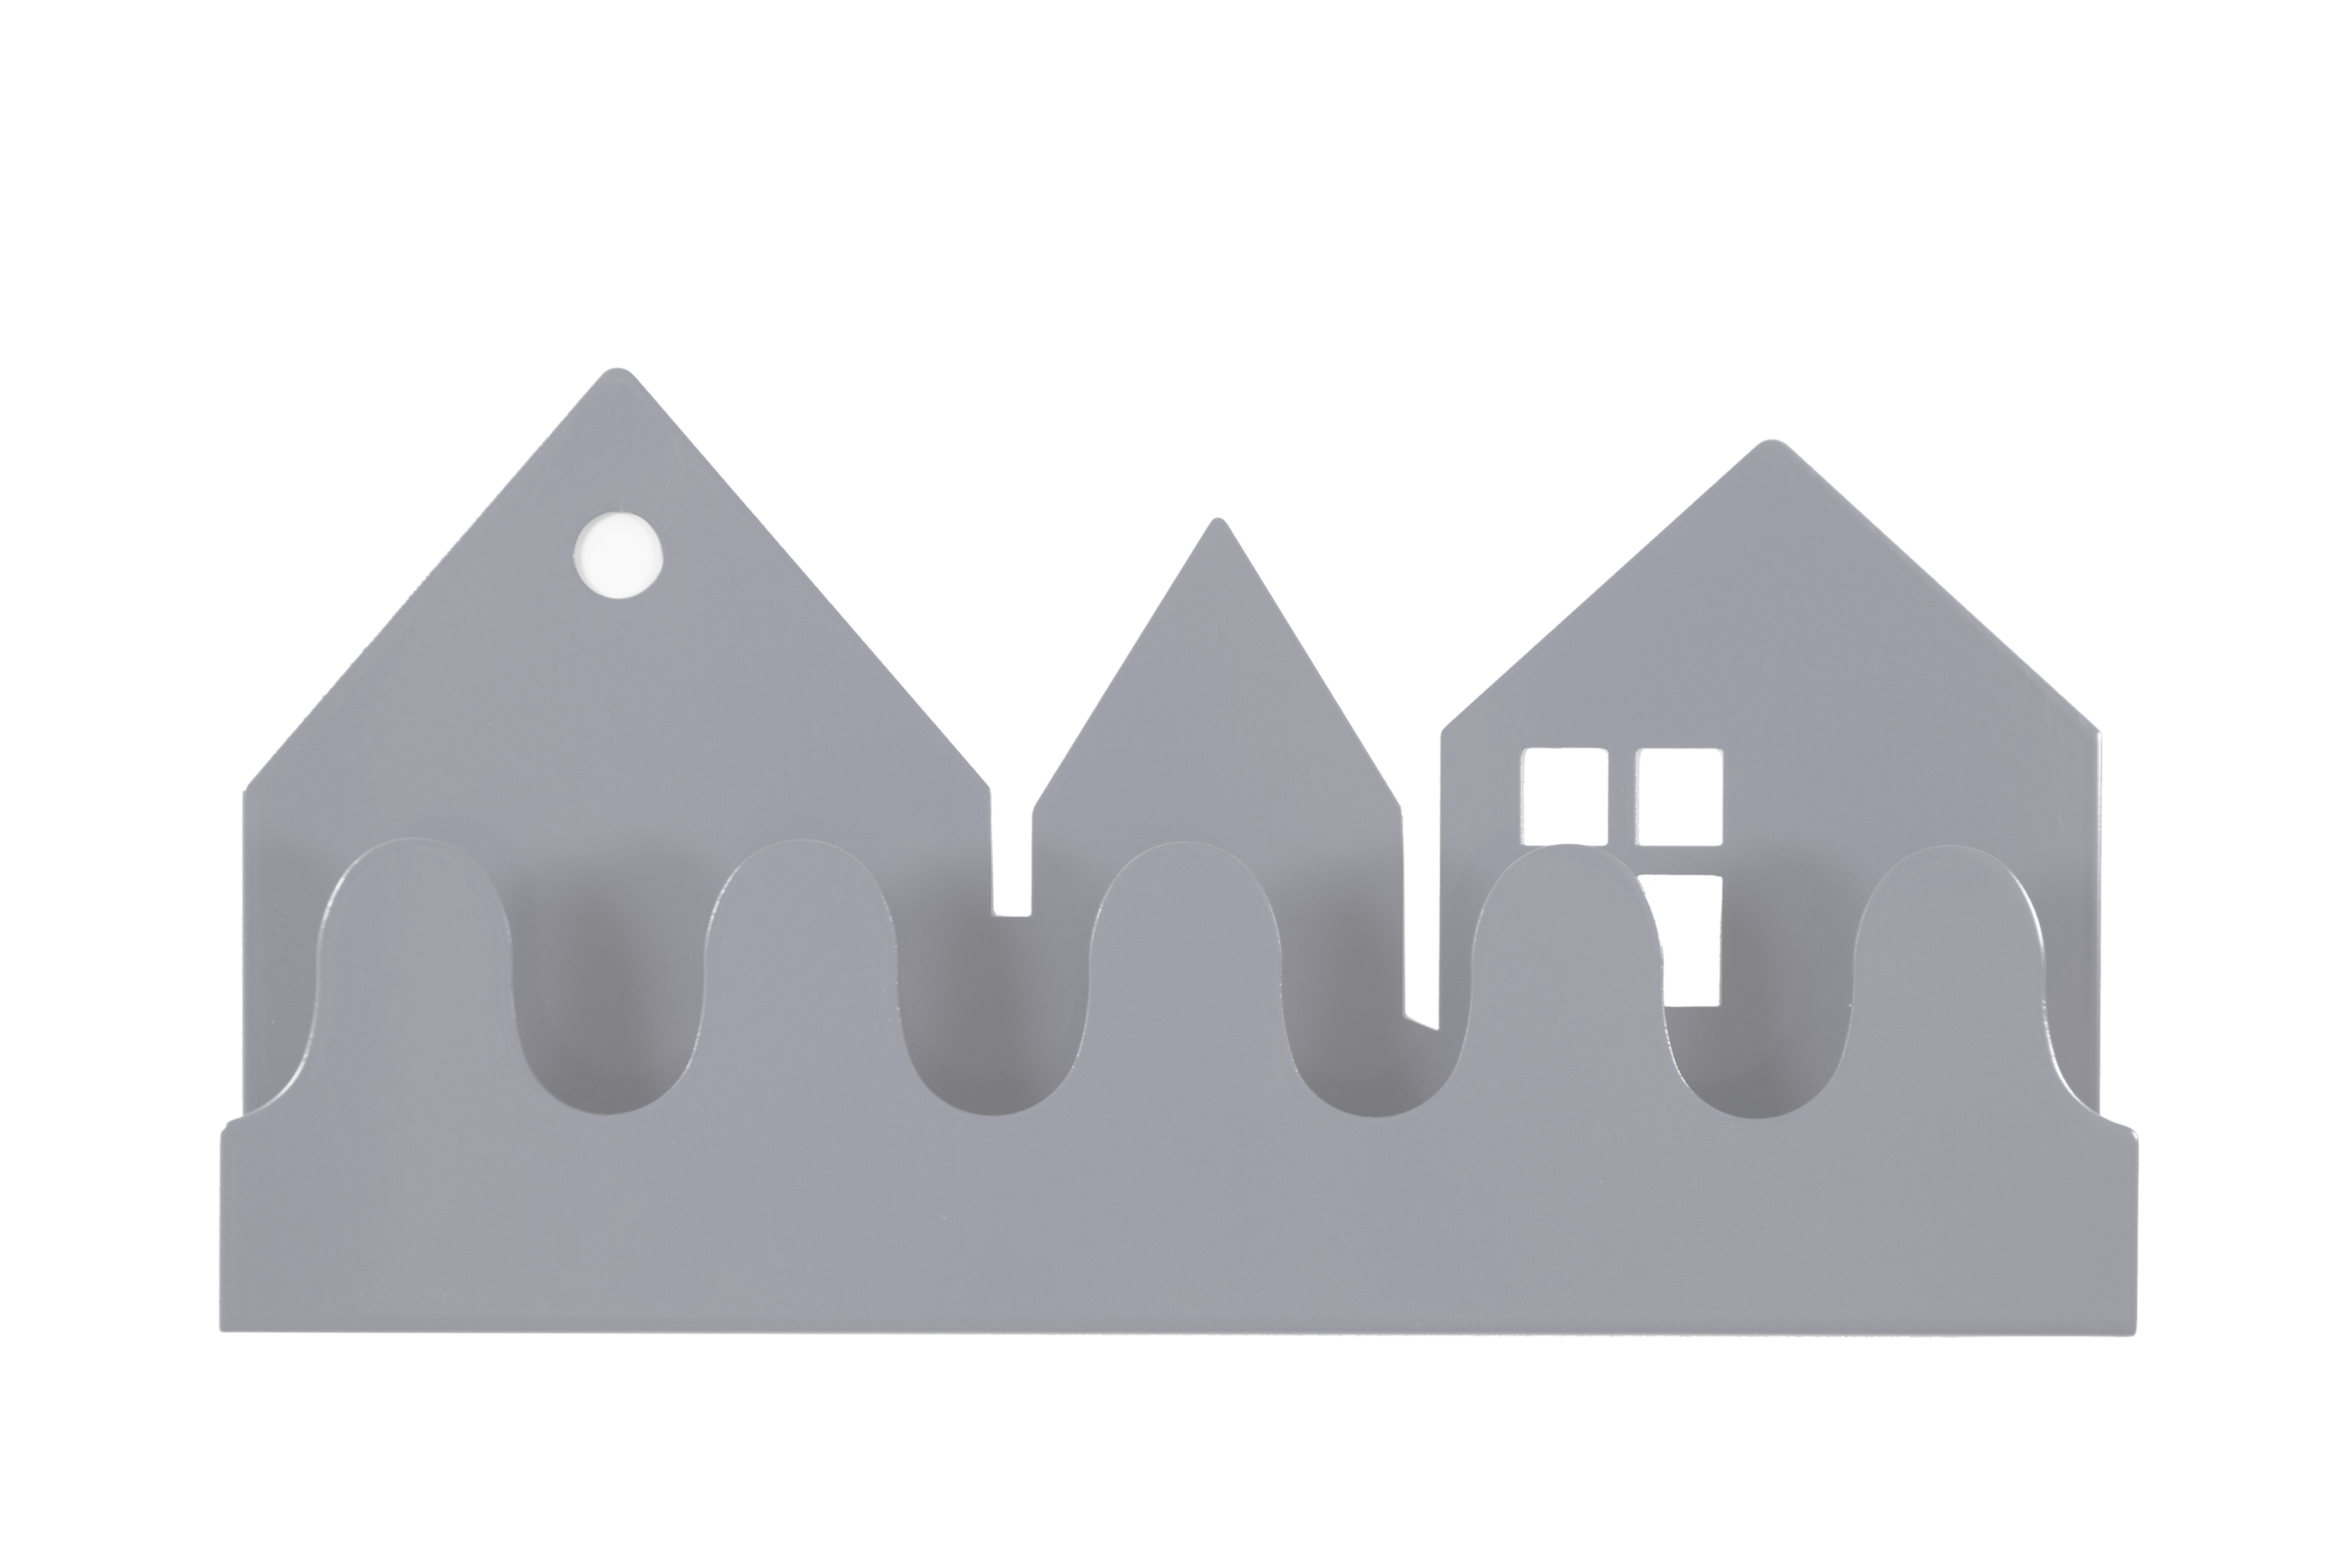 Roommate Village Klädhängare - Grå